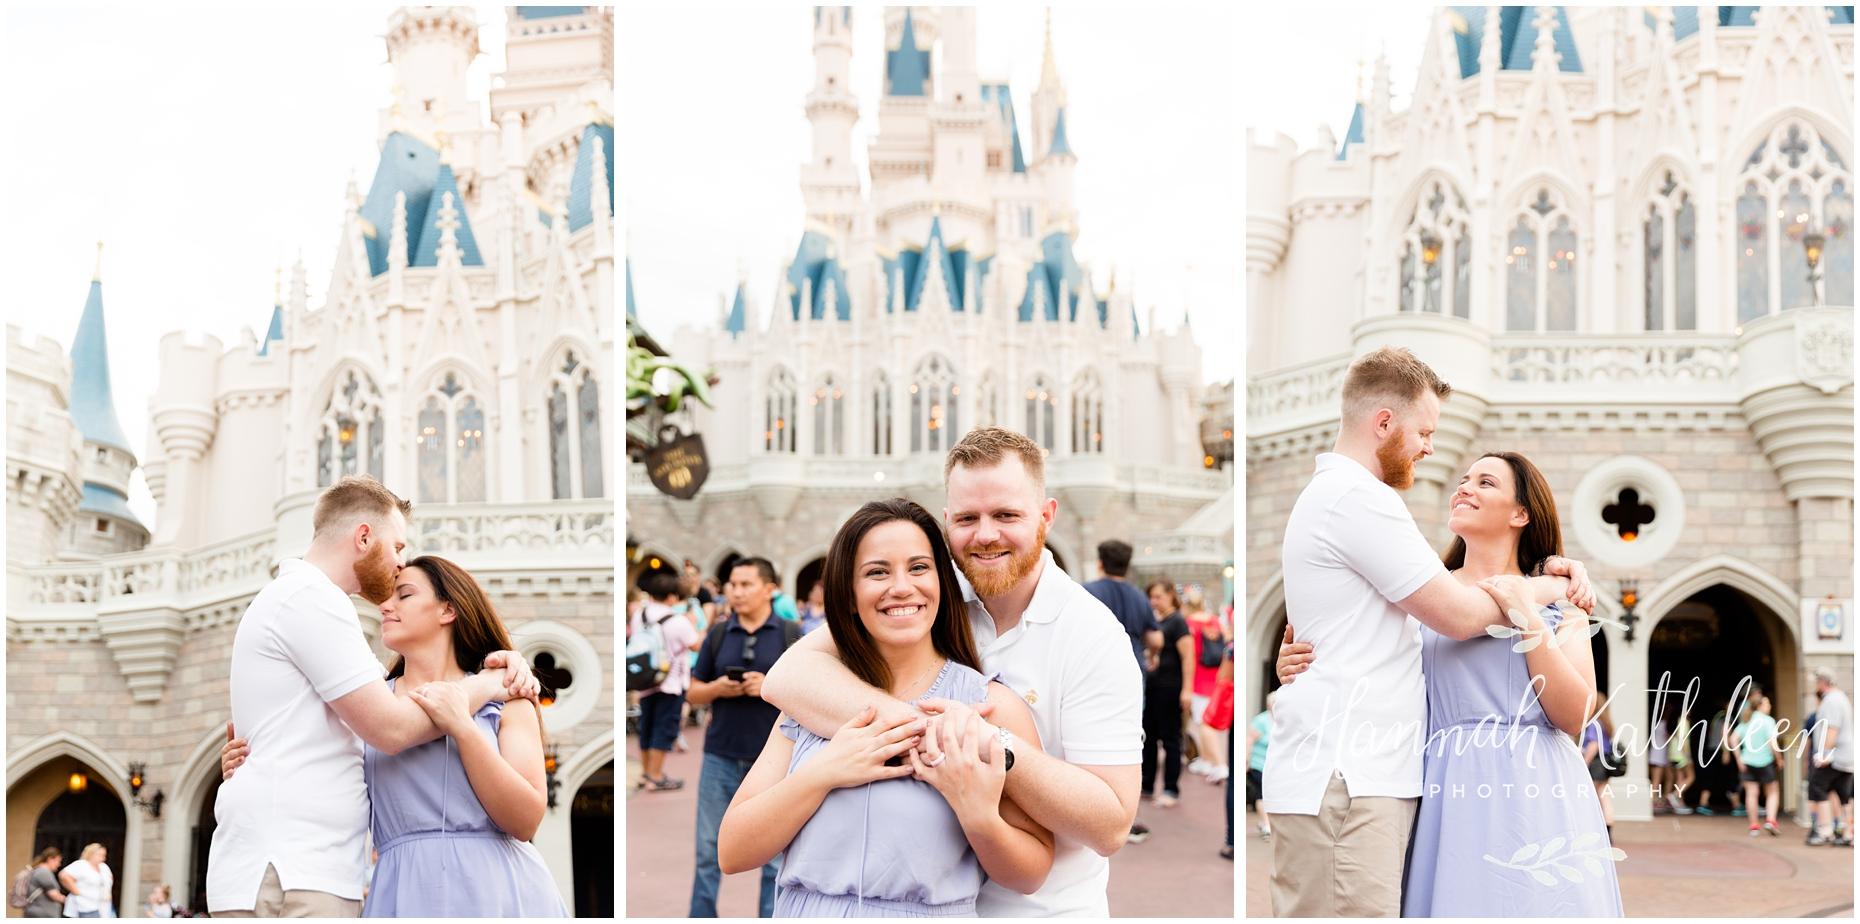 Pennell_Disney_Parks_Family_World_Disneyland_Photographer